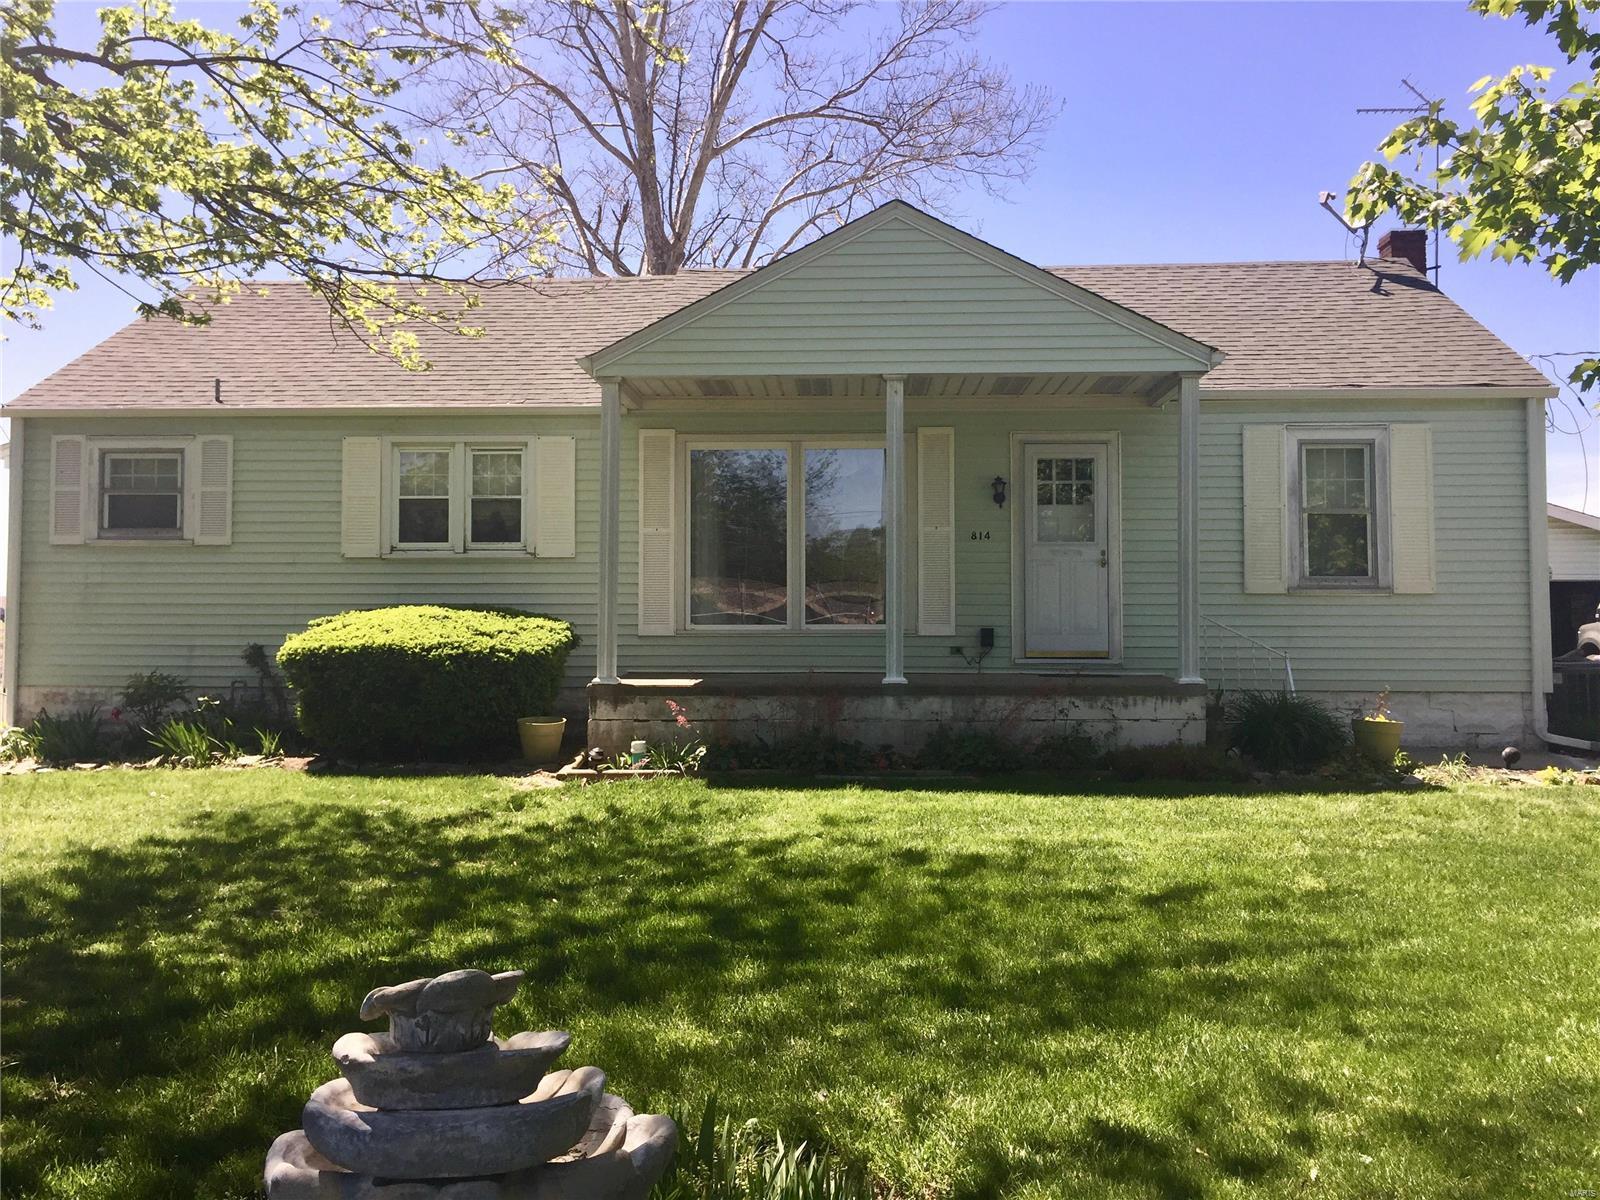 814 S Maple Street Property Photo - Brighton, IL real estate listing